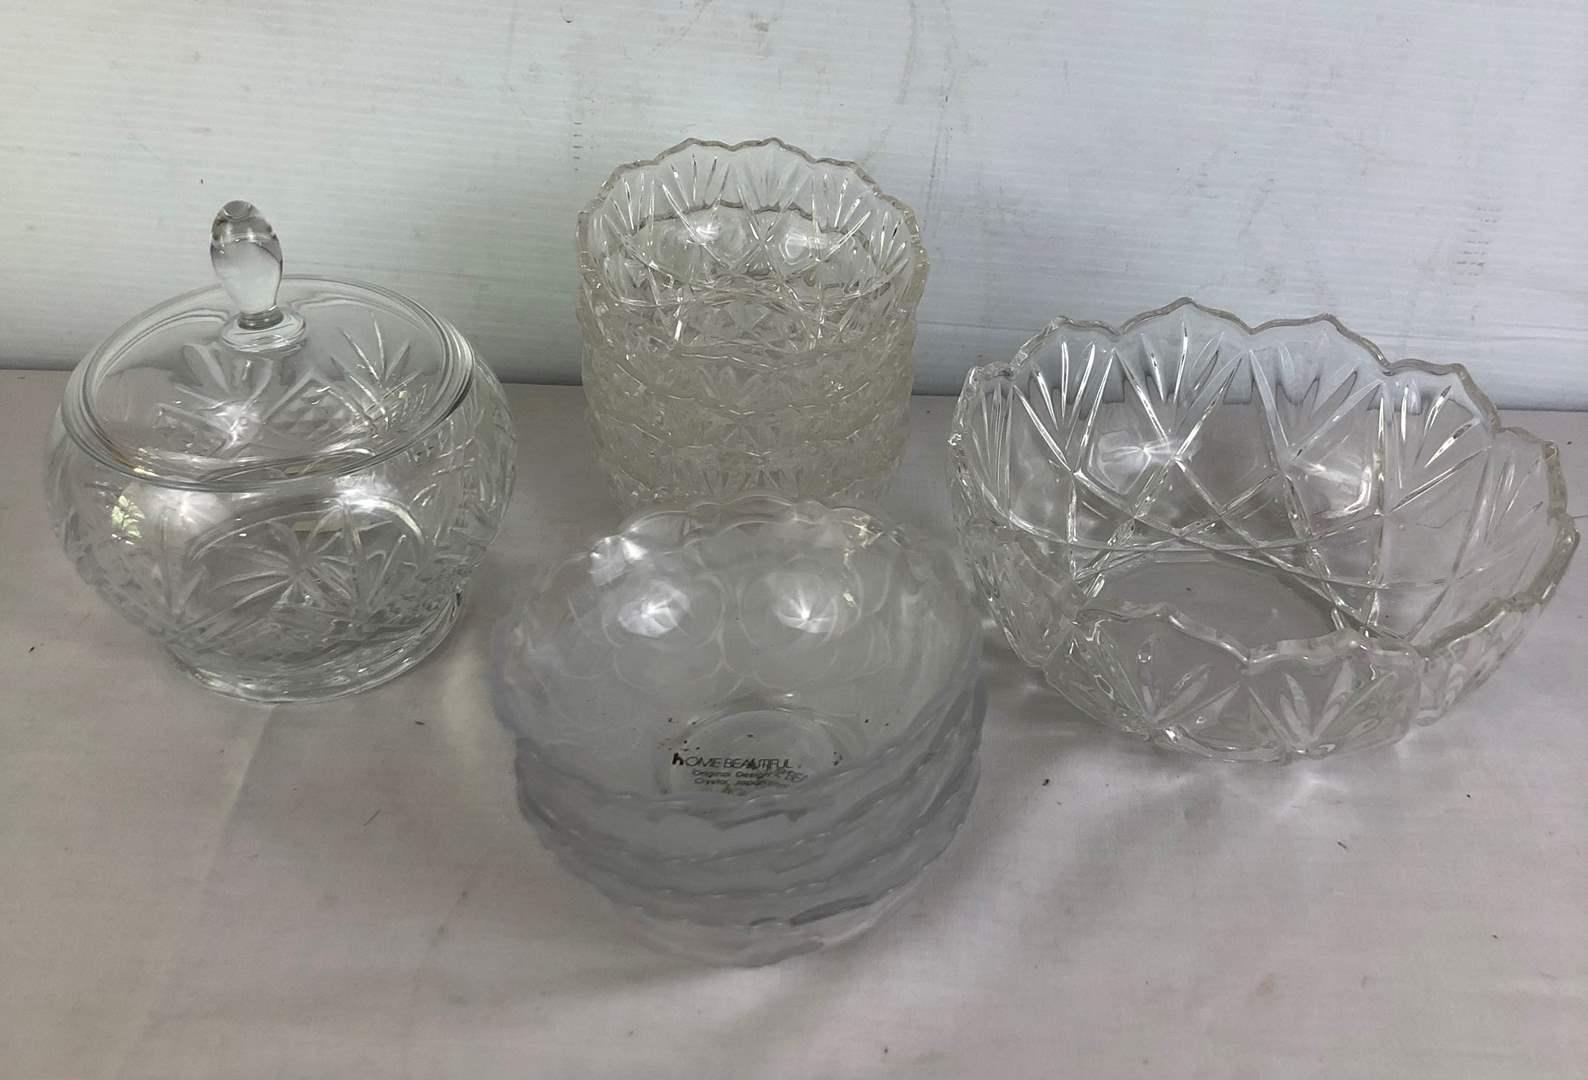 Lot # 148 - Lot of Glass Dishware Bowls Crystal (main image)